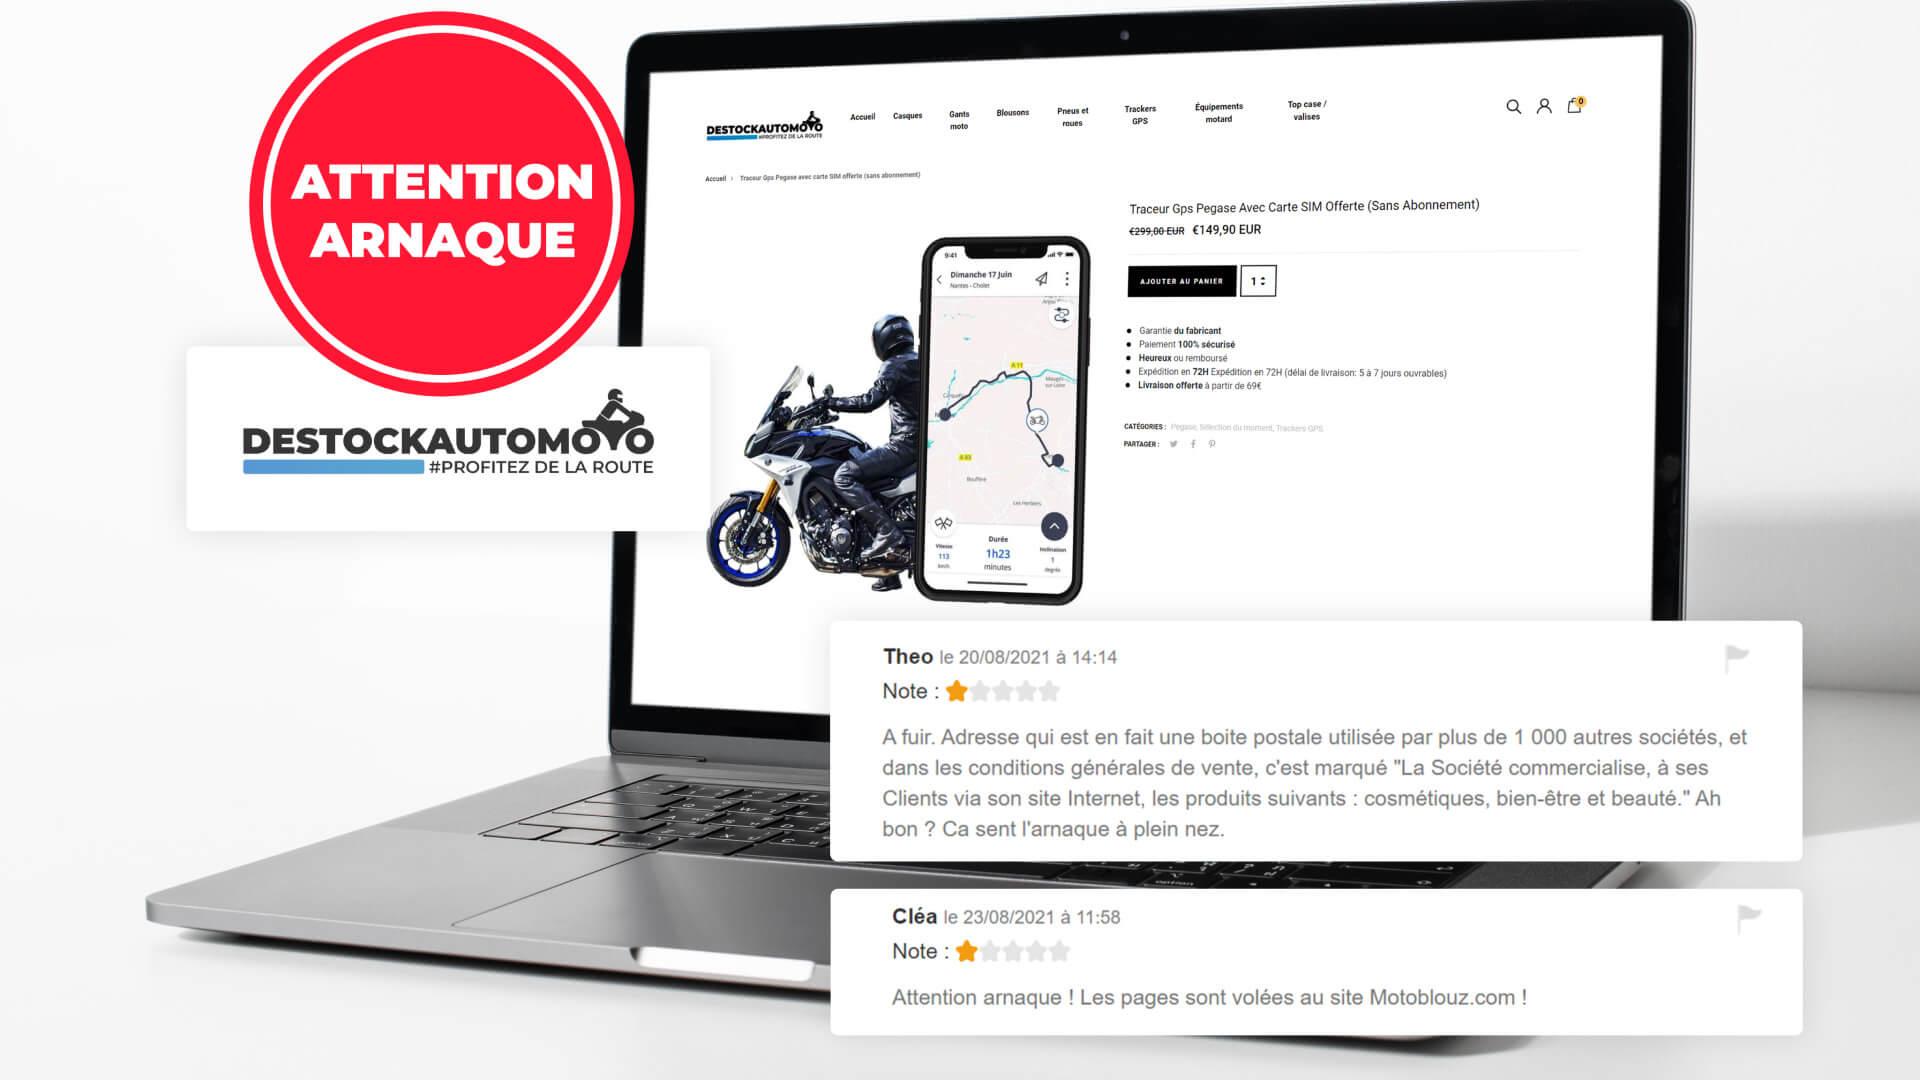 Le site DestockAutoMoto.com est une escroquerie